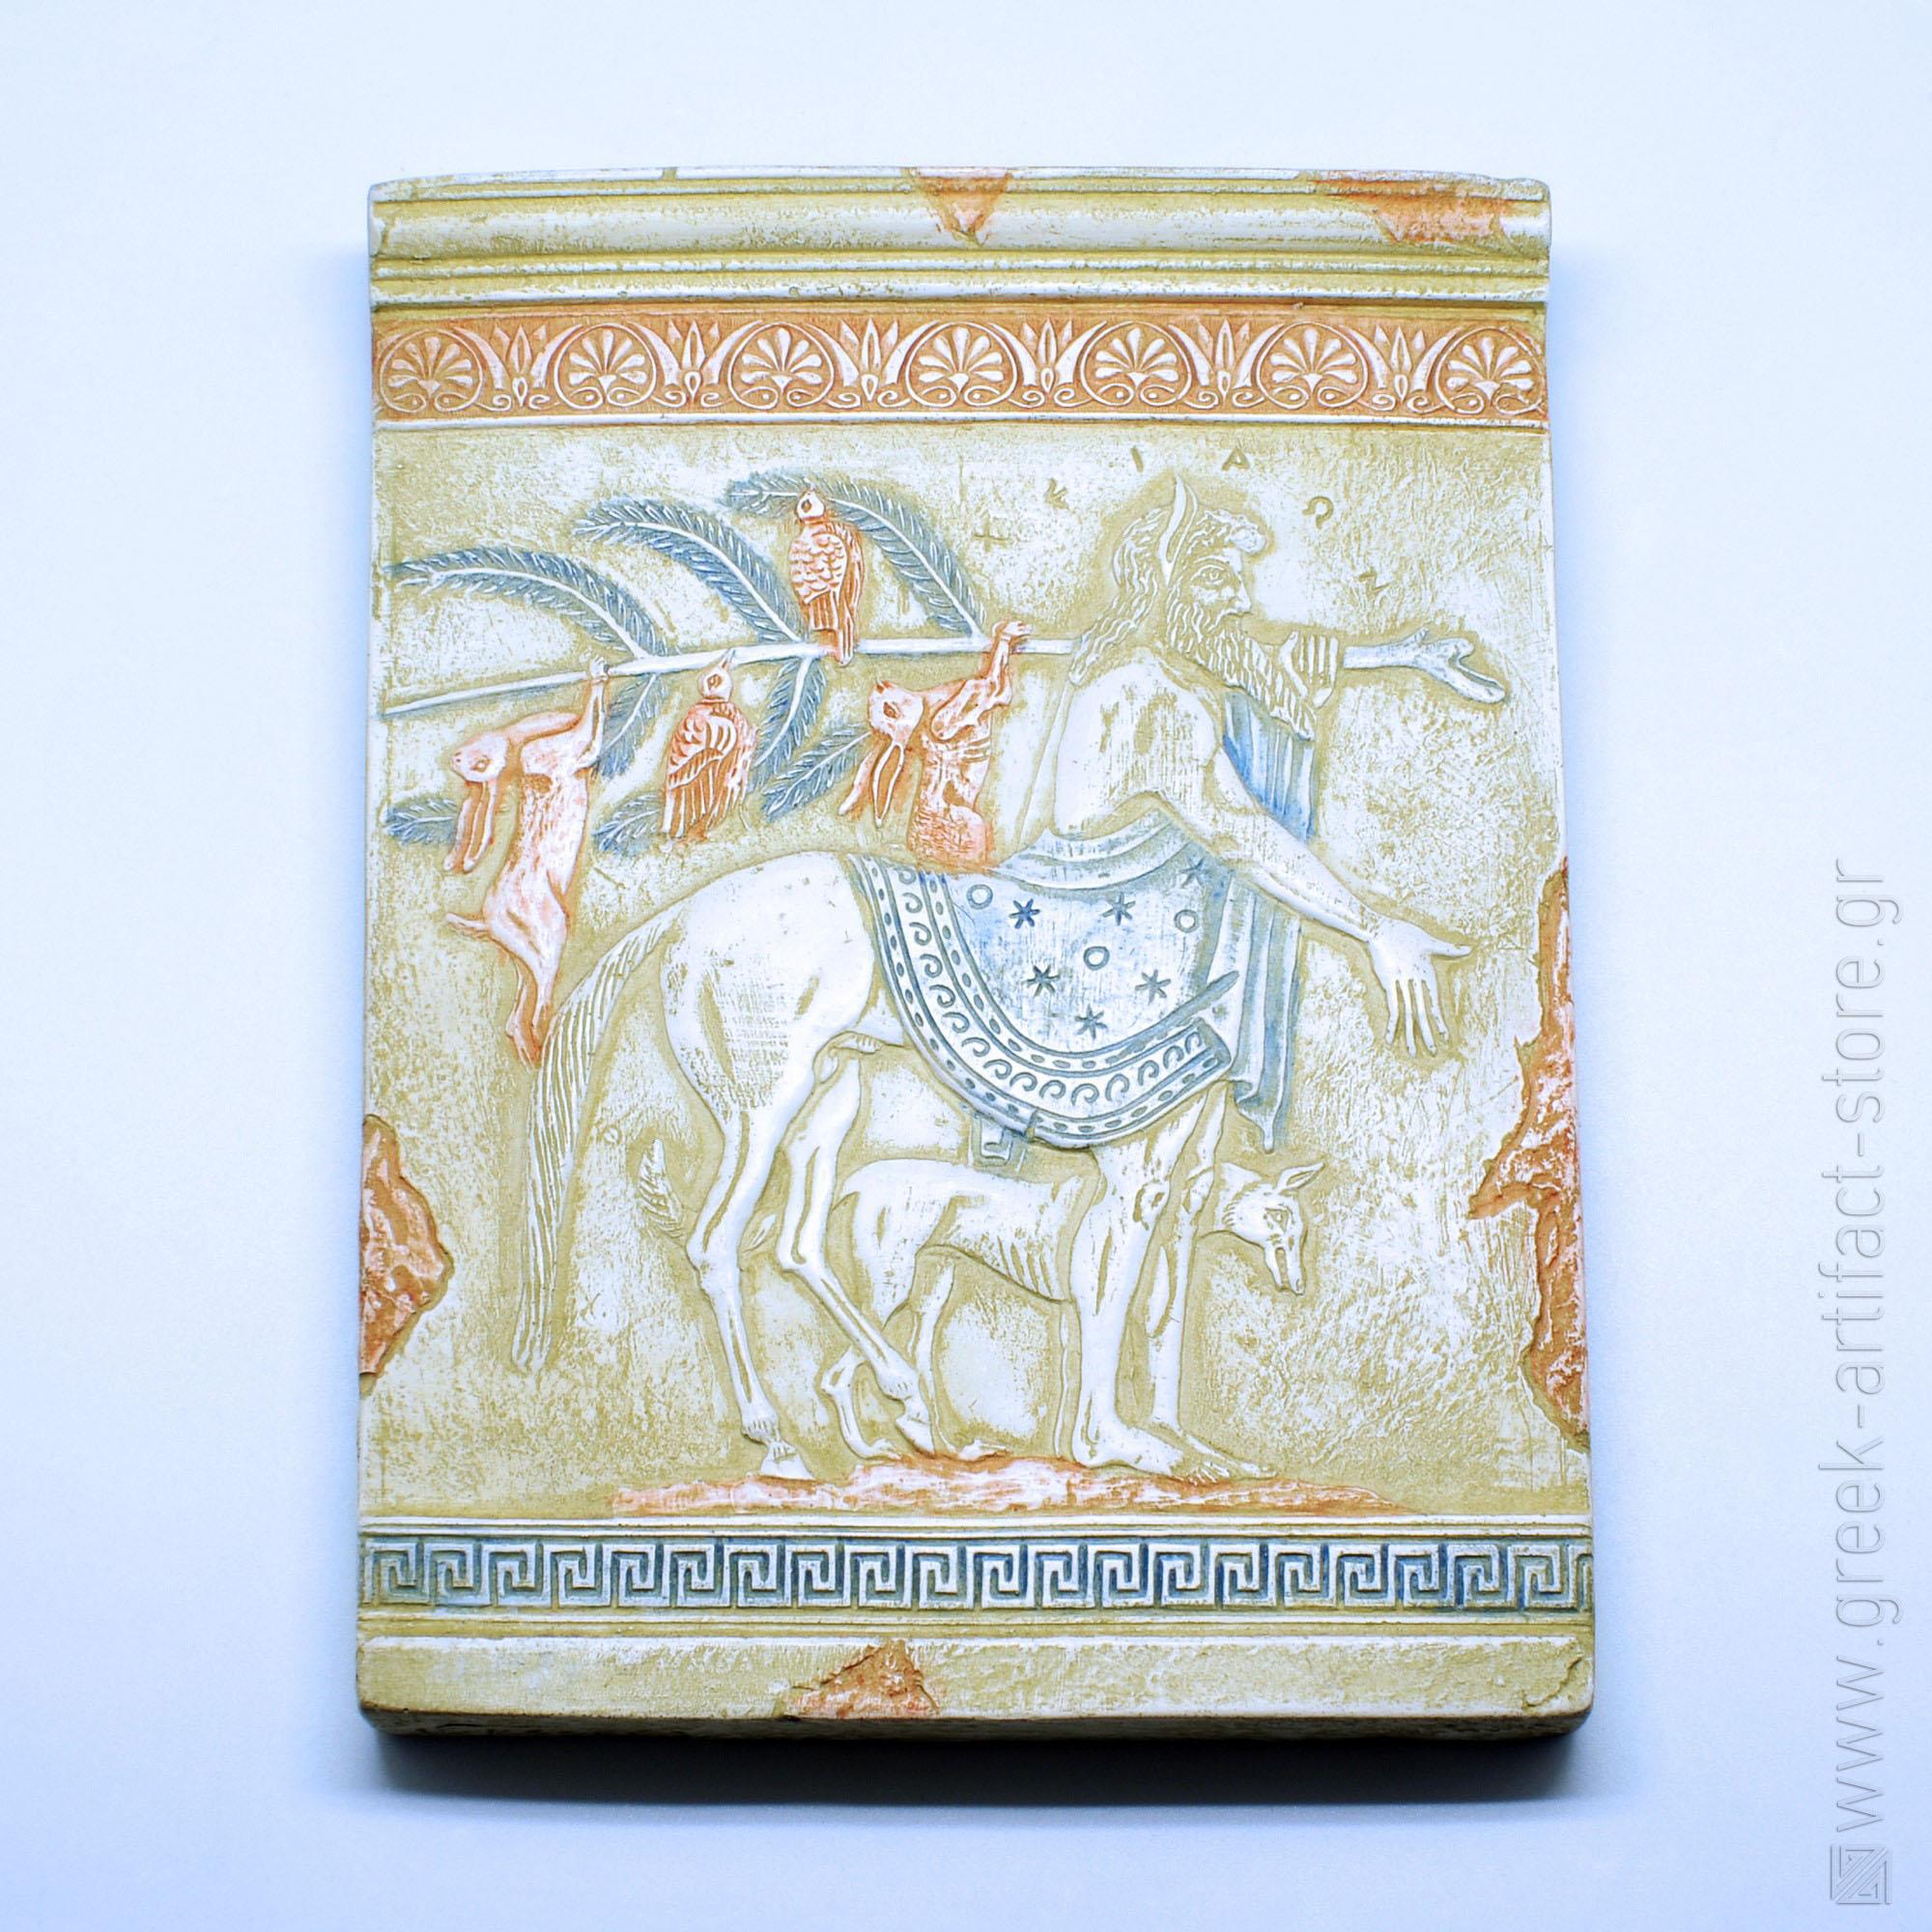 Centaur relief (18x25 cm)